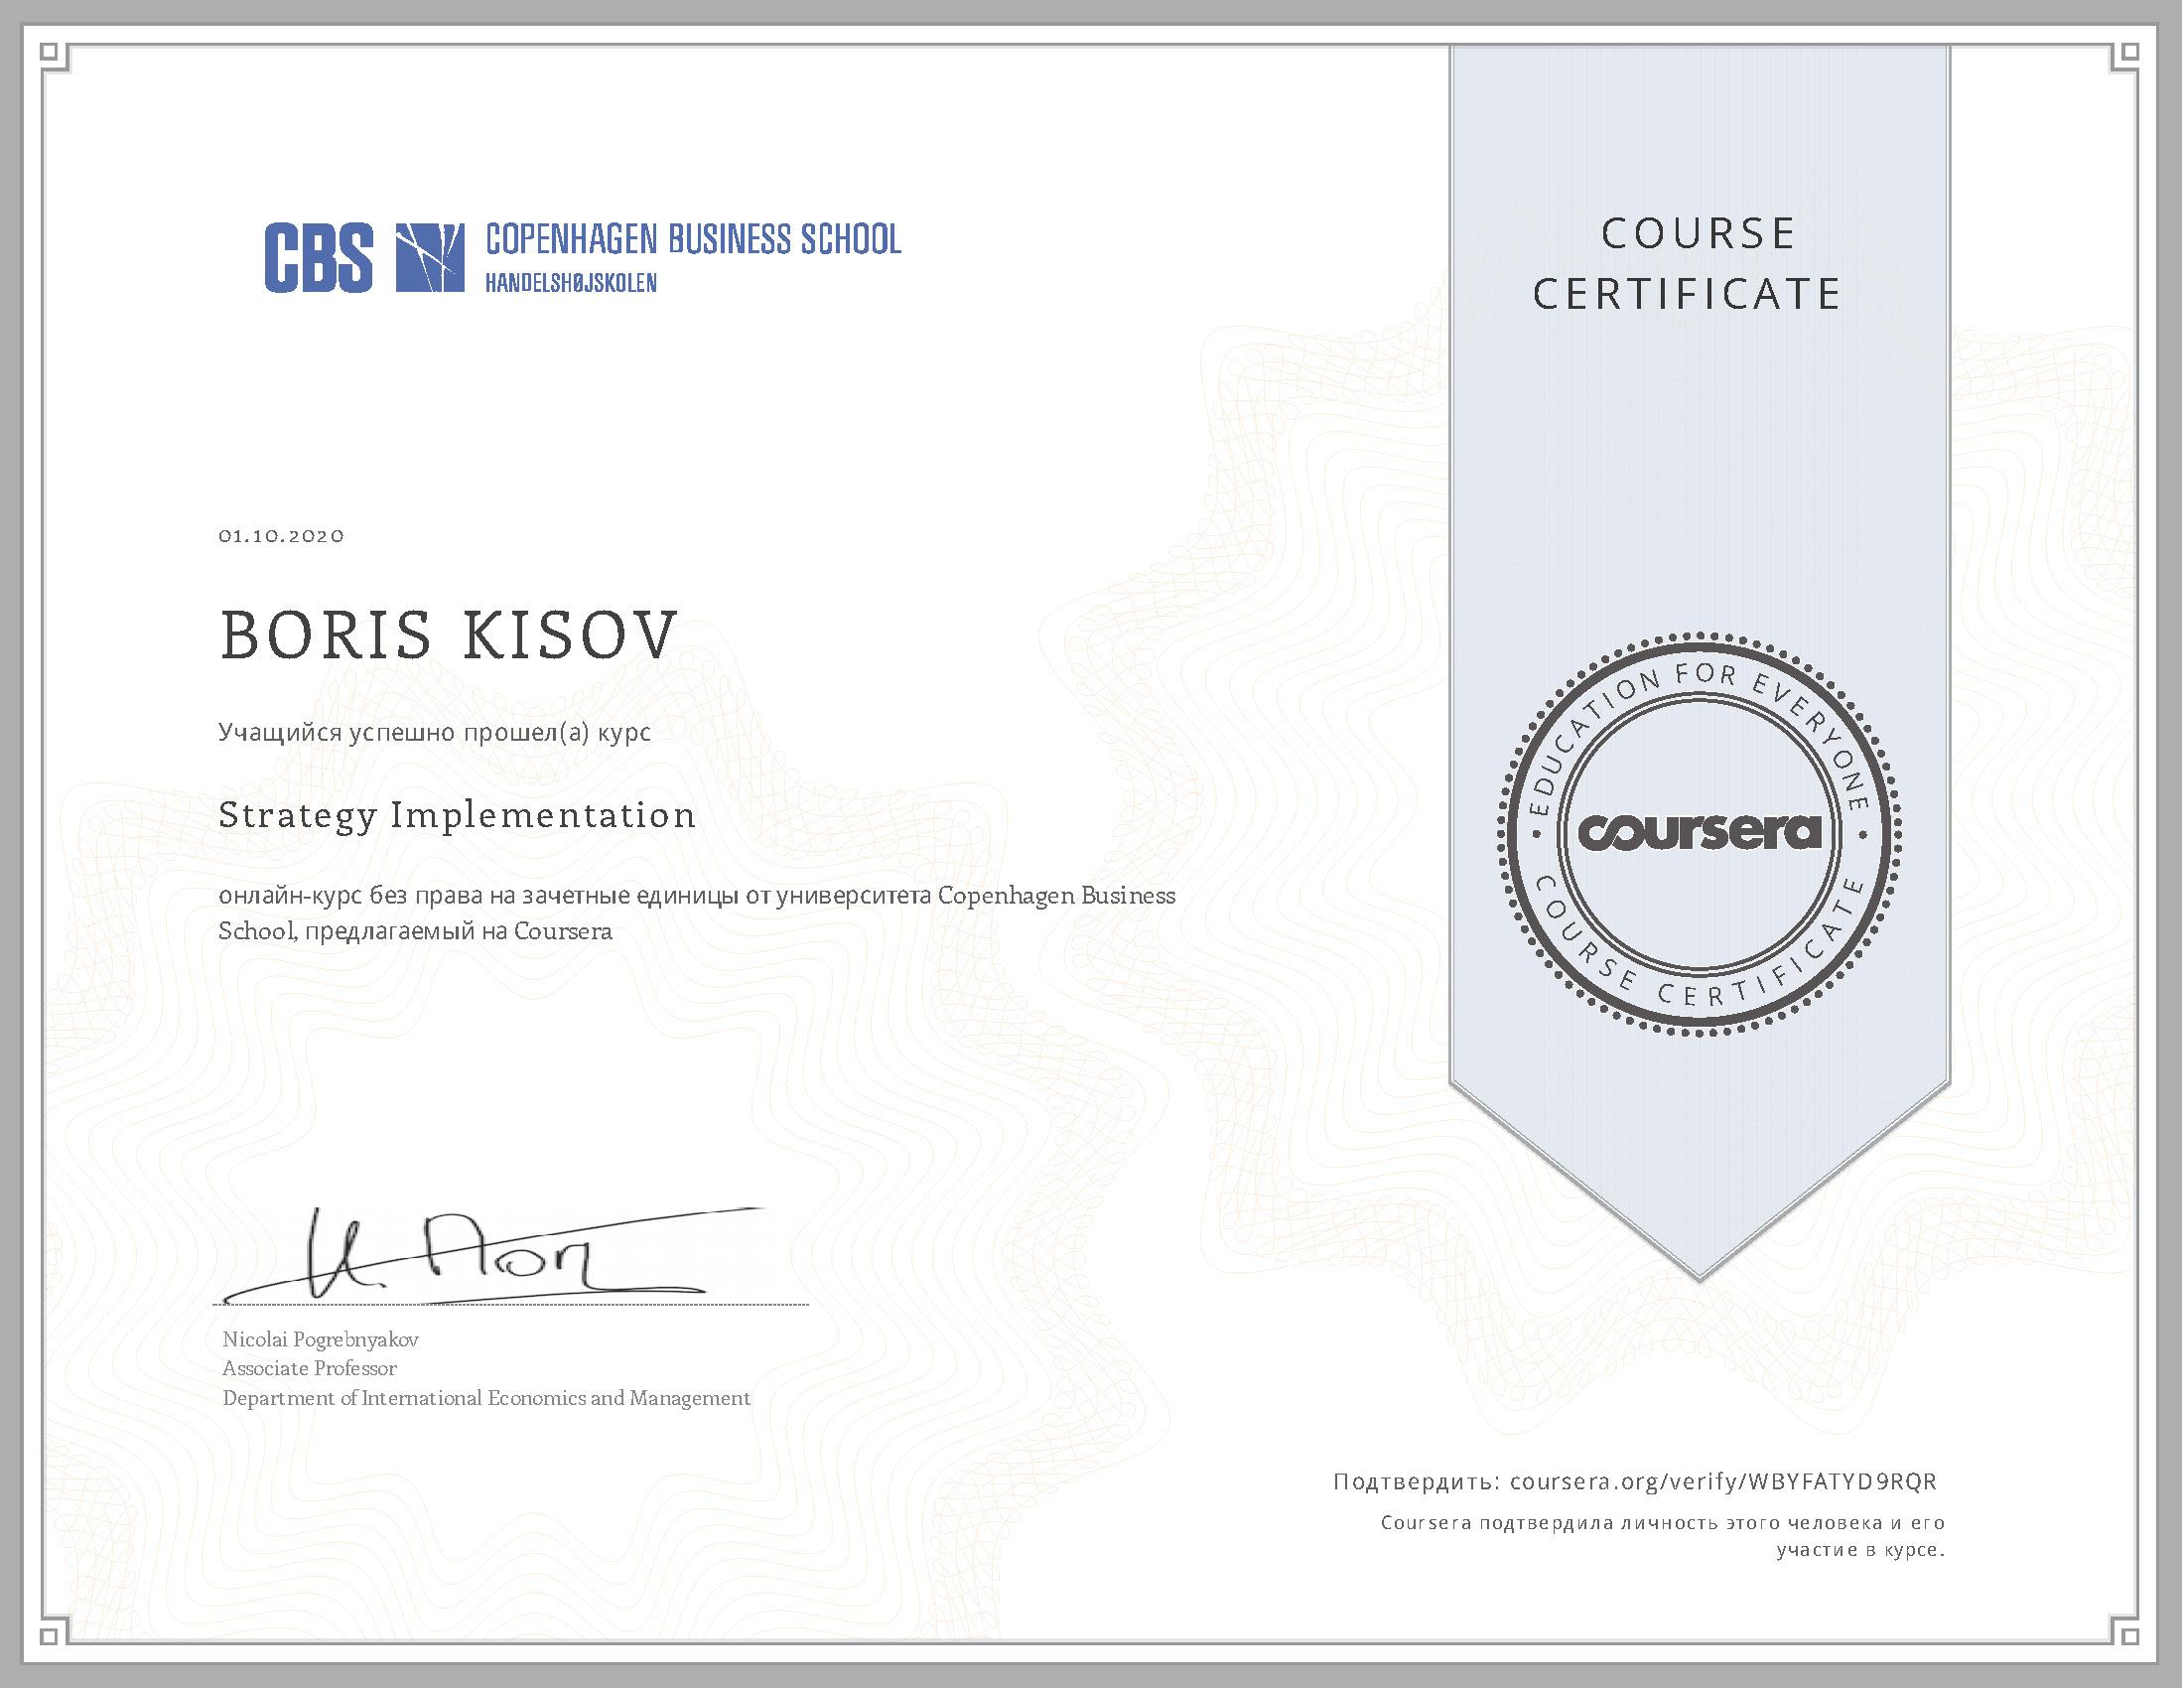 Copenhagen Business School - Strategy Implementation